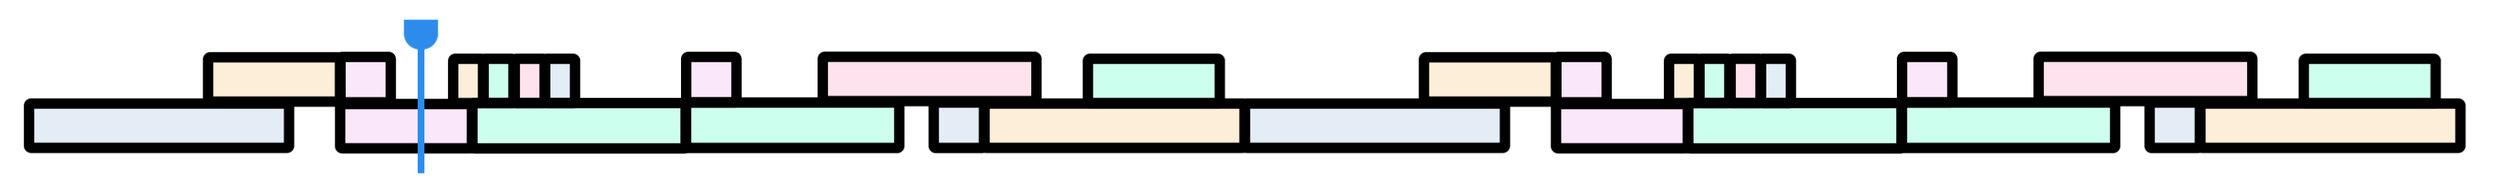 Edit squares long.jpg